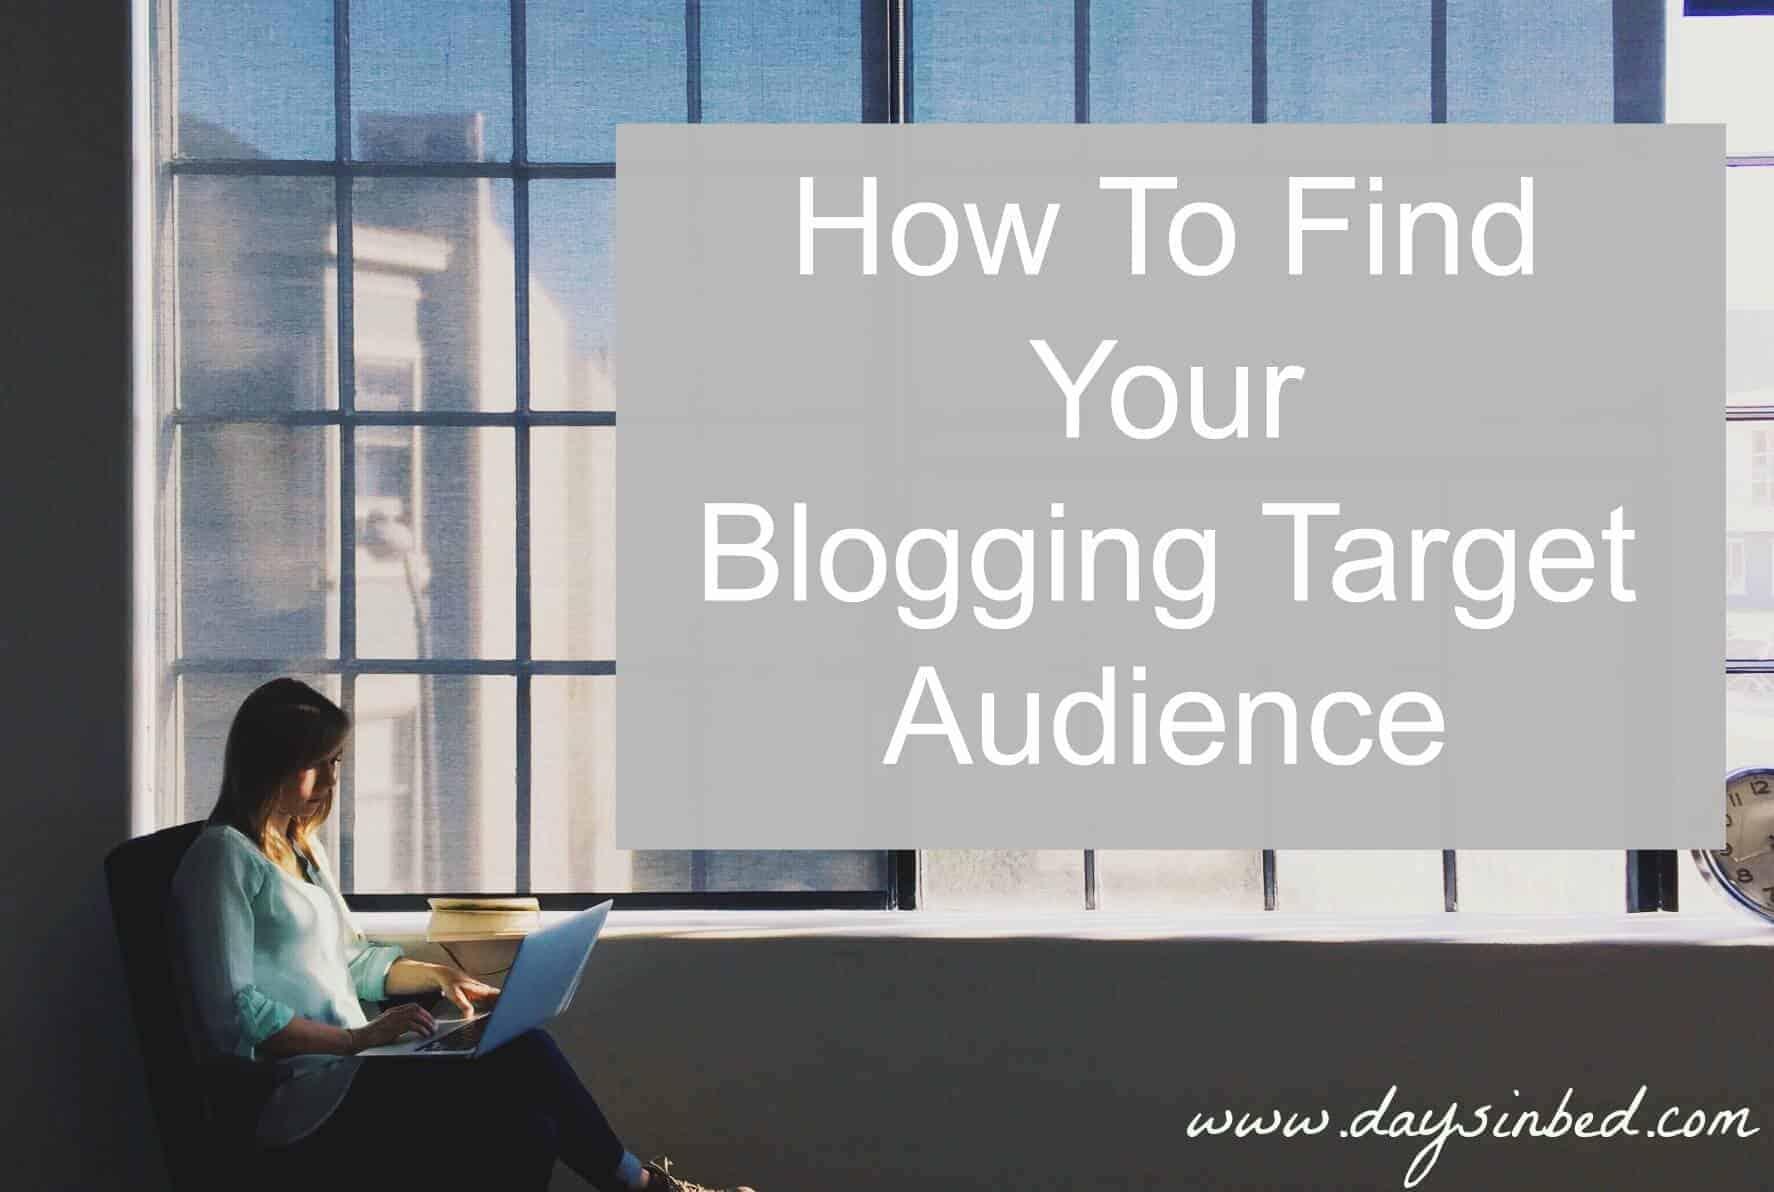 Blogging Target Audience